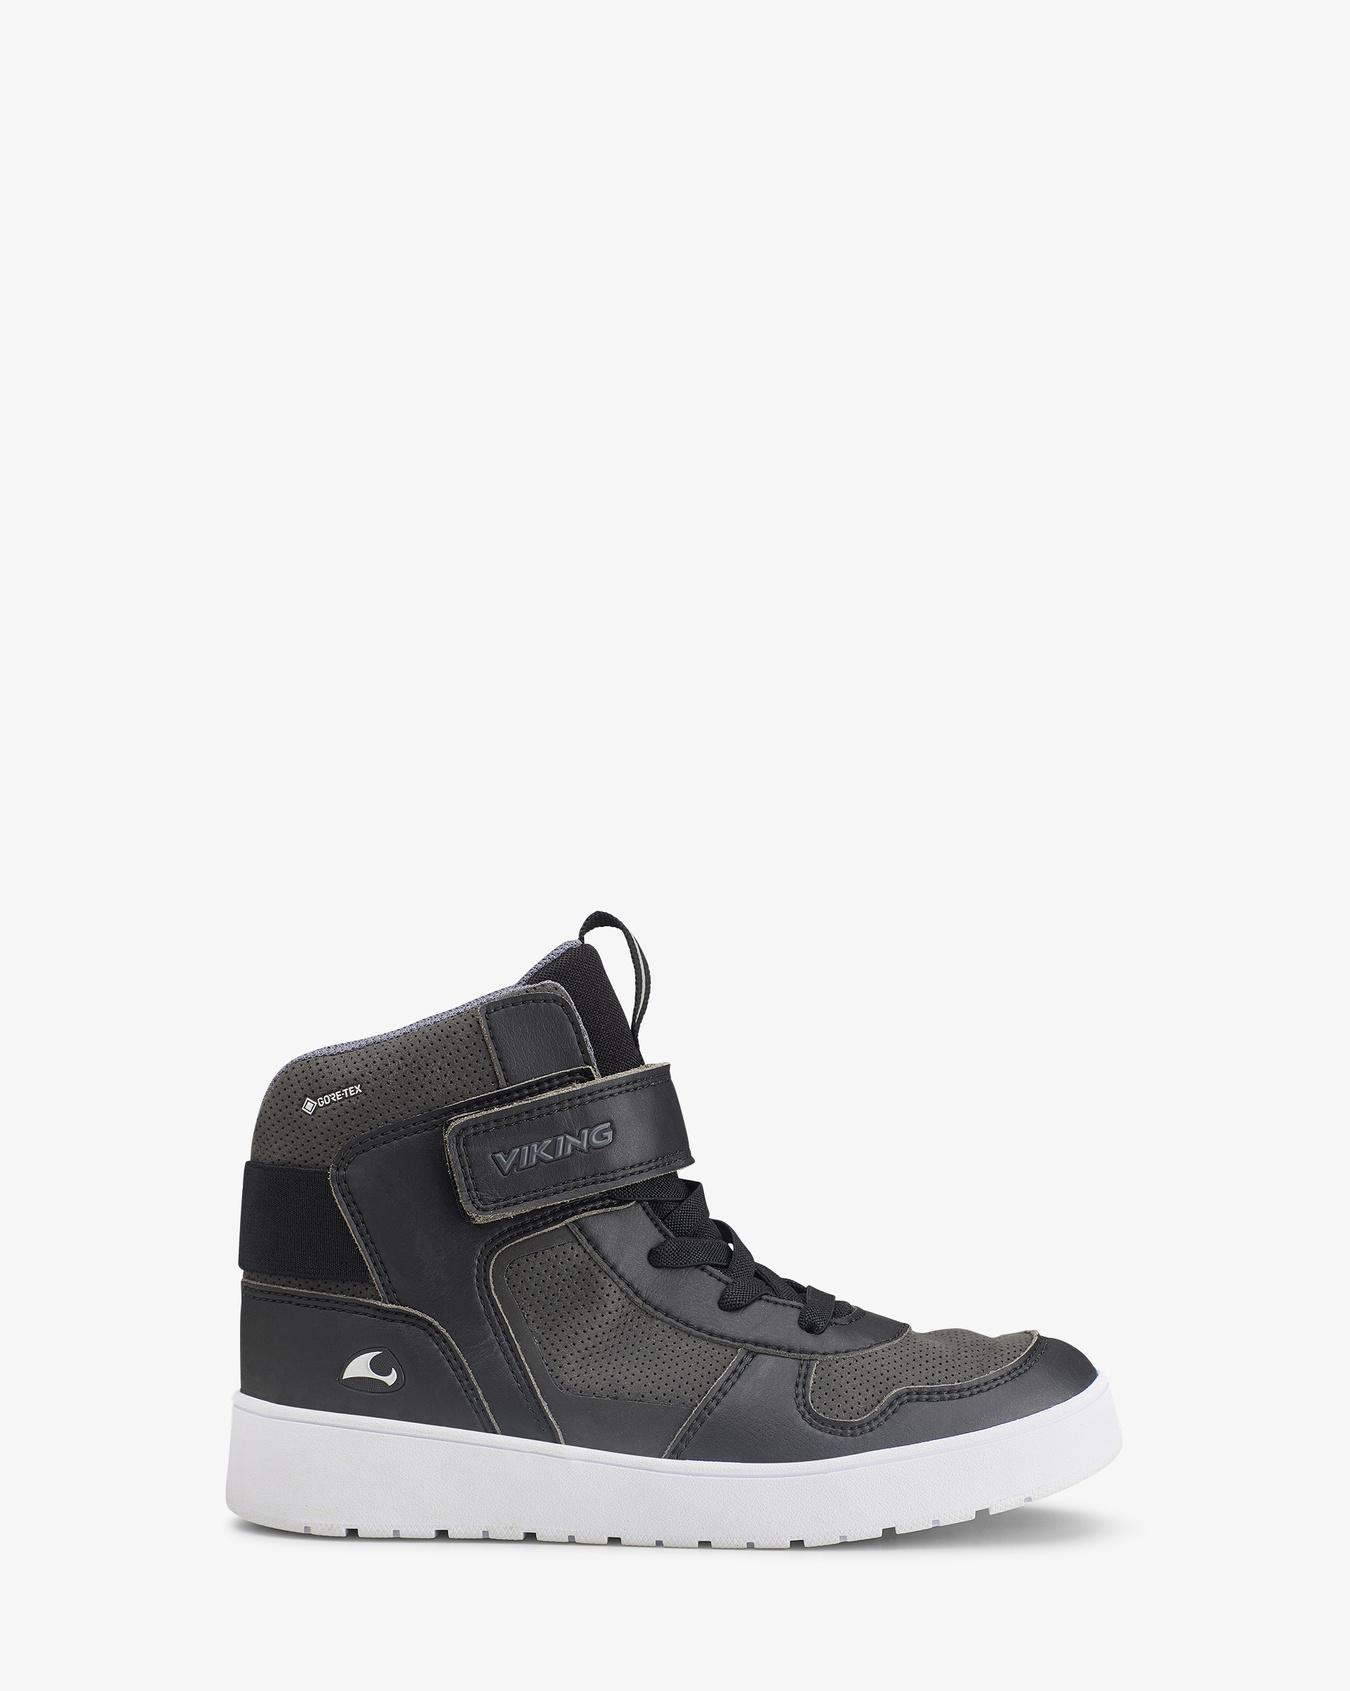 VFX Mid GTX Black Sneakers